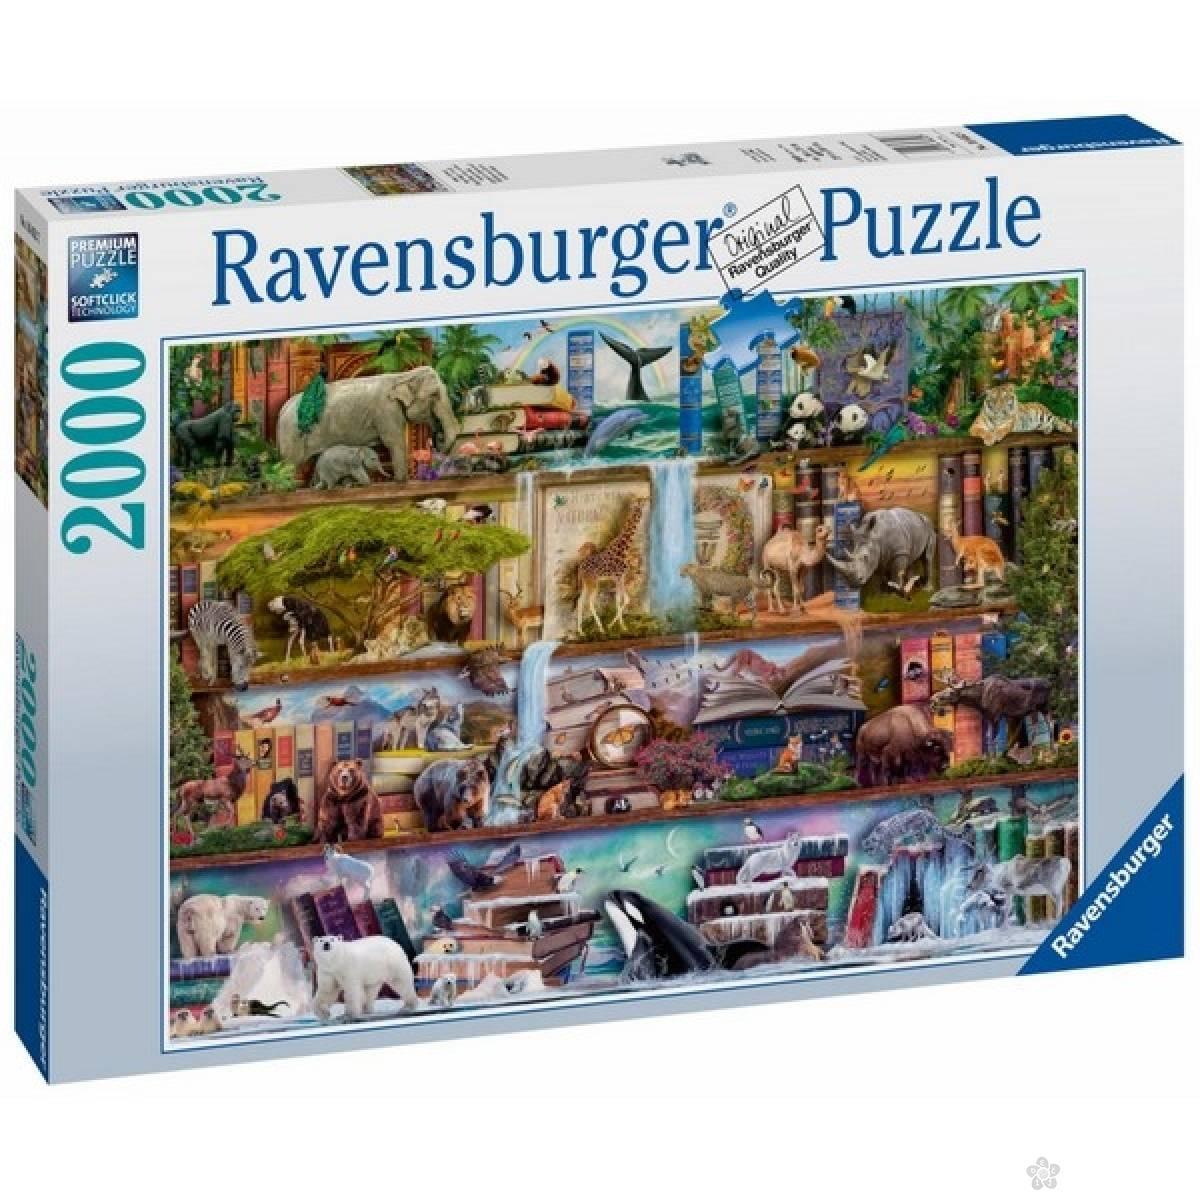 Ravensburger puzzle Prelepo zivotinjsko carstvo RA16652